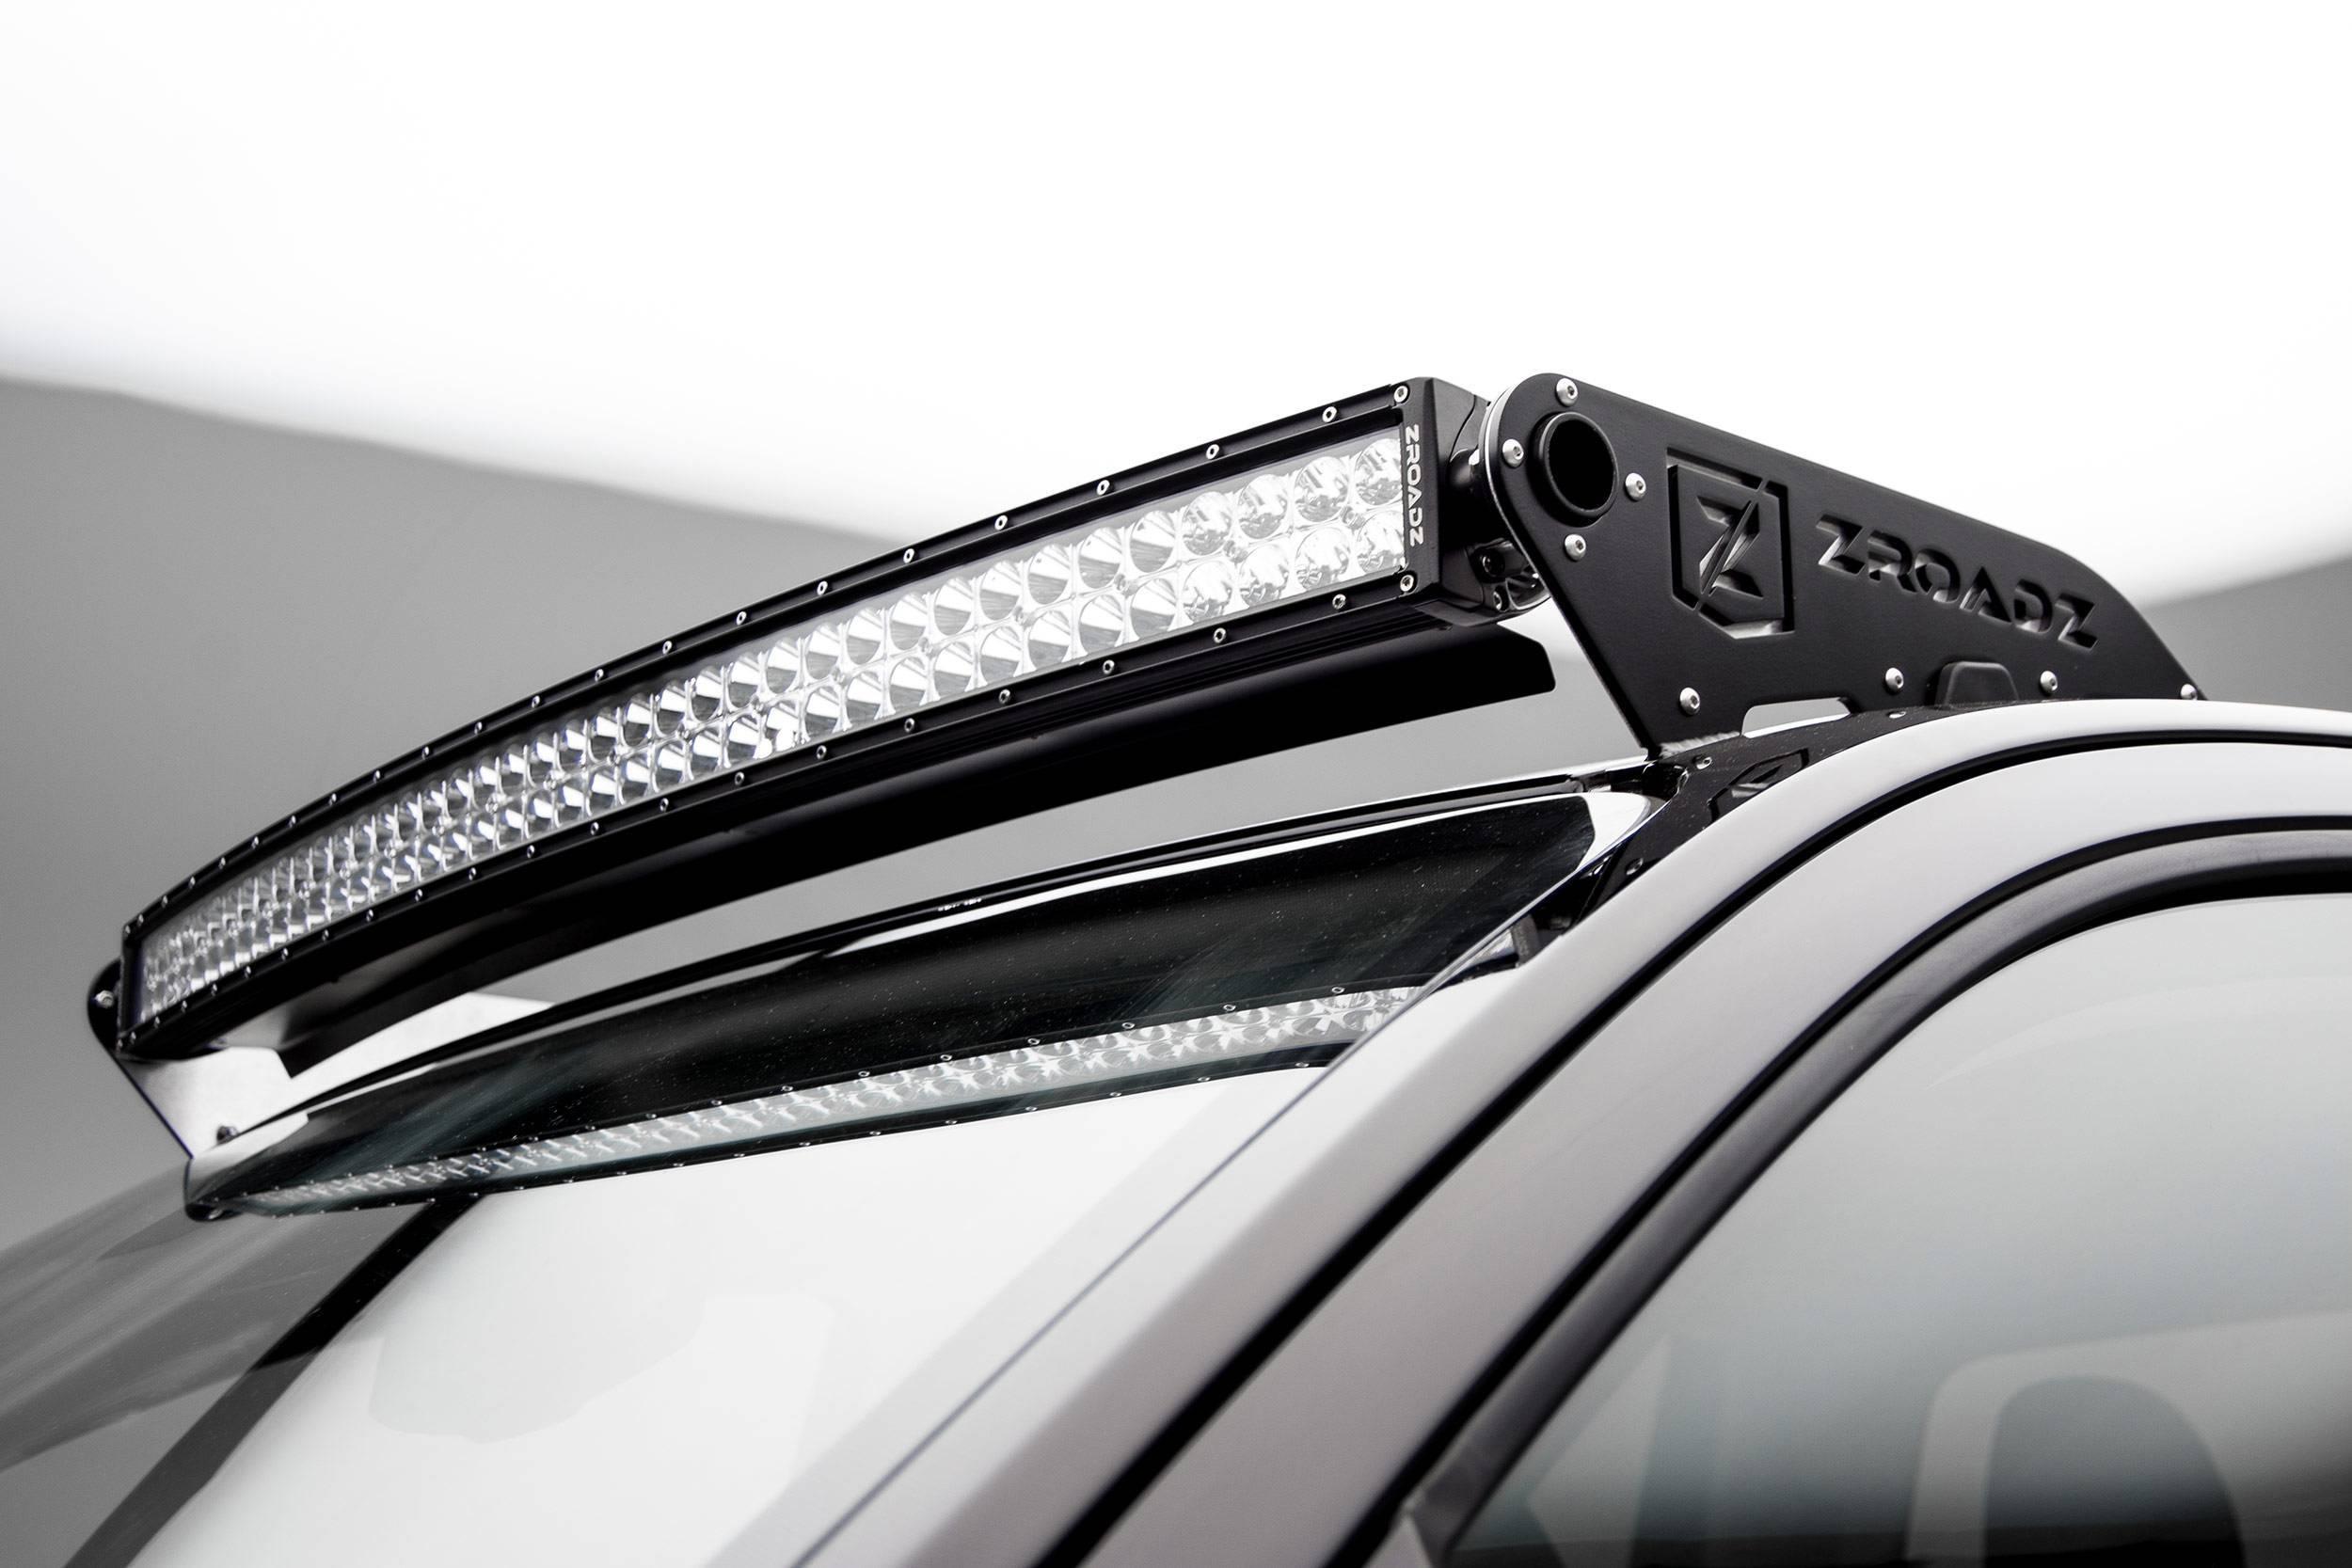 ZROADZ - 2015-2020 Colorado, Canyon Front Roof LED Bracket to mount 40 Inch Curved LED Light Bar - PN #Z332671